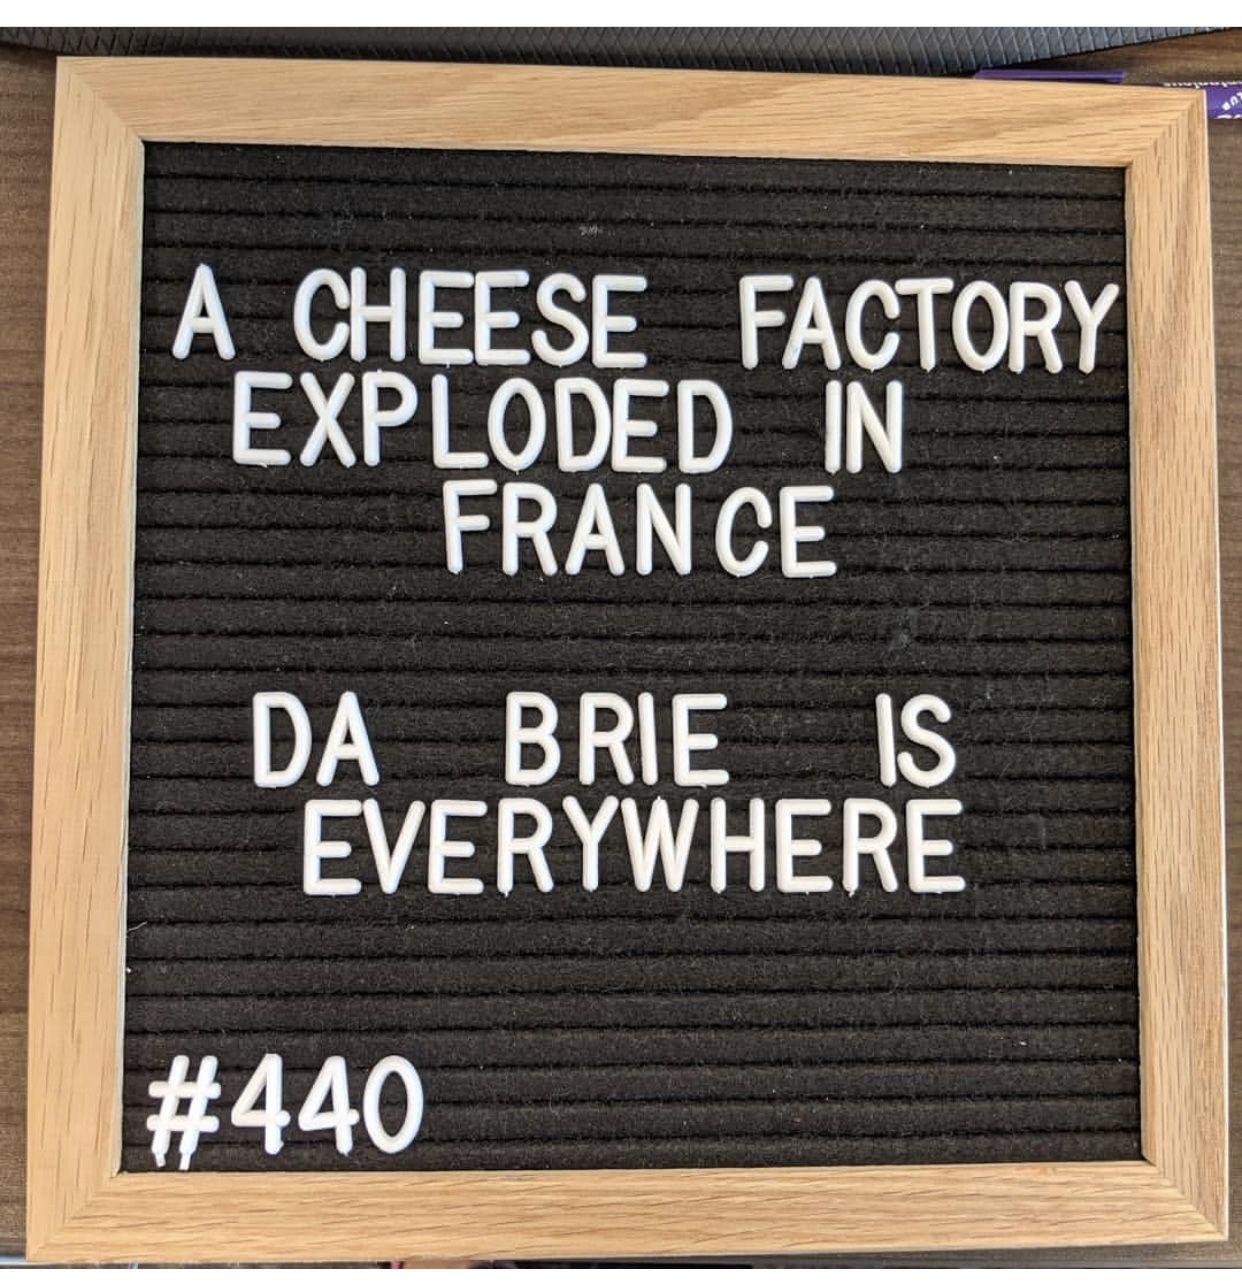 Cheese Factory Exploded Corny Jokes Message Board Quotes Haha Funny